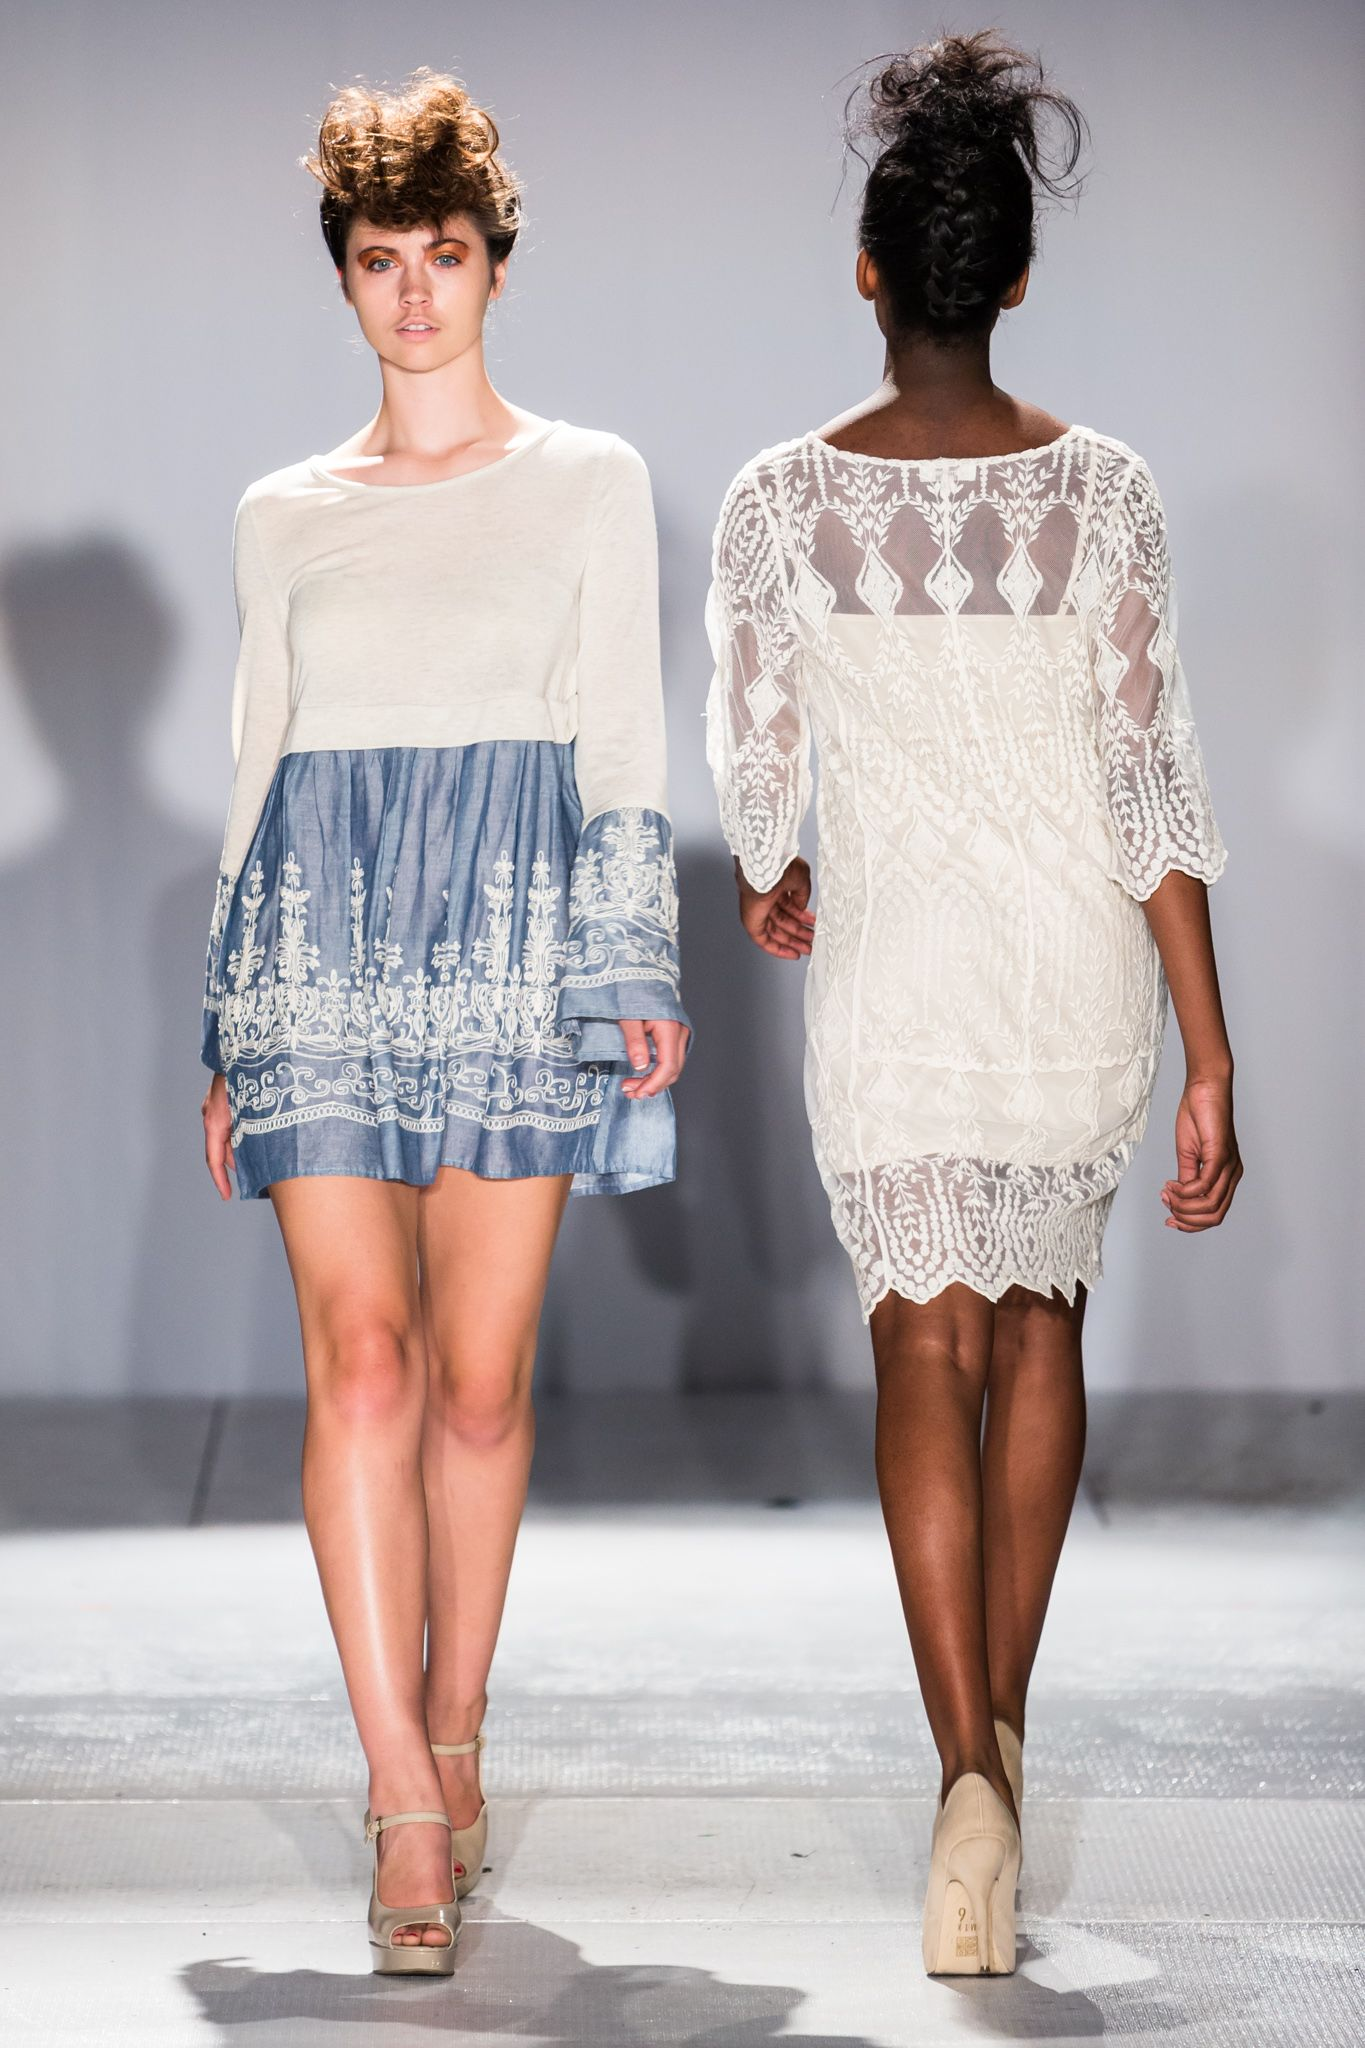 AntHill by Anthony Ryan Runway Show at Birmingham Fashion Week   May 8 2015 #AntHill #AnthonyRyan  #fashion #bfw #bfw2015 #fashion #runway #birmingham #alabama #birminghamal #model #models #designer #designers #stylists #stylist #hmu #hair #makeup #design